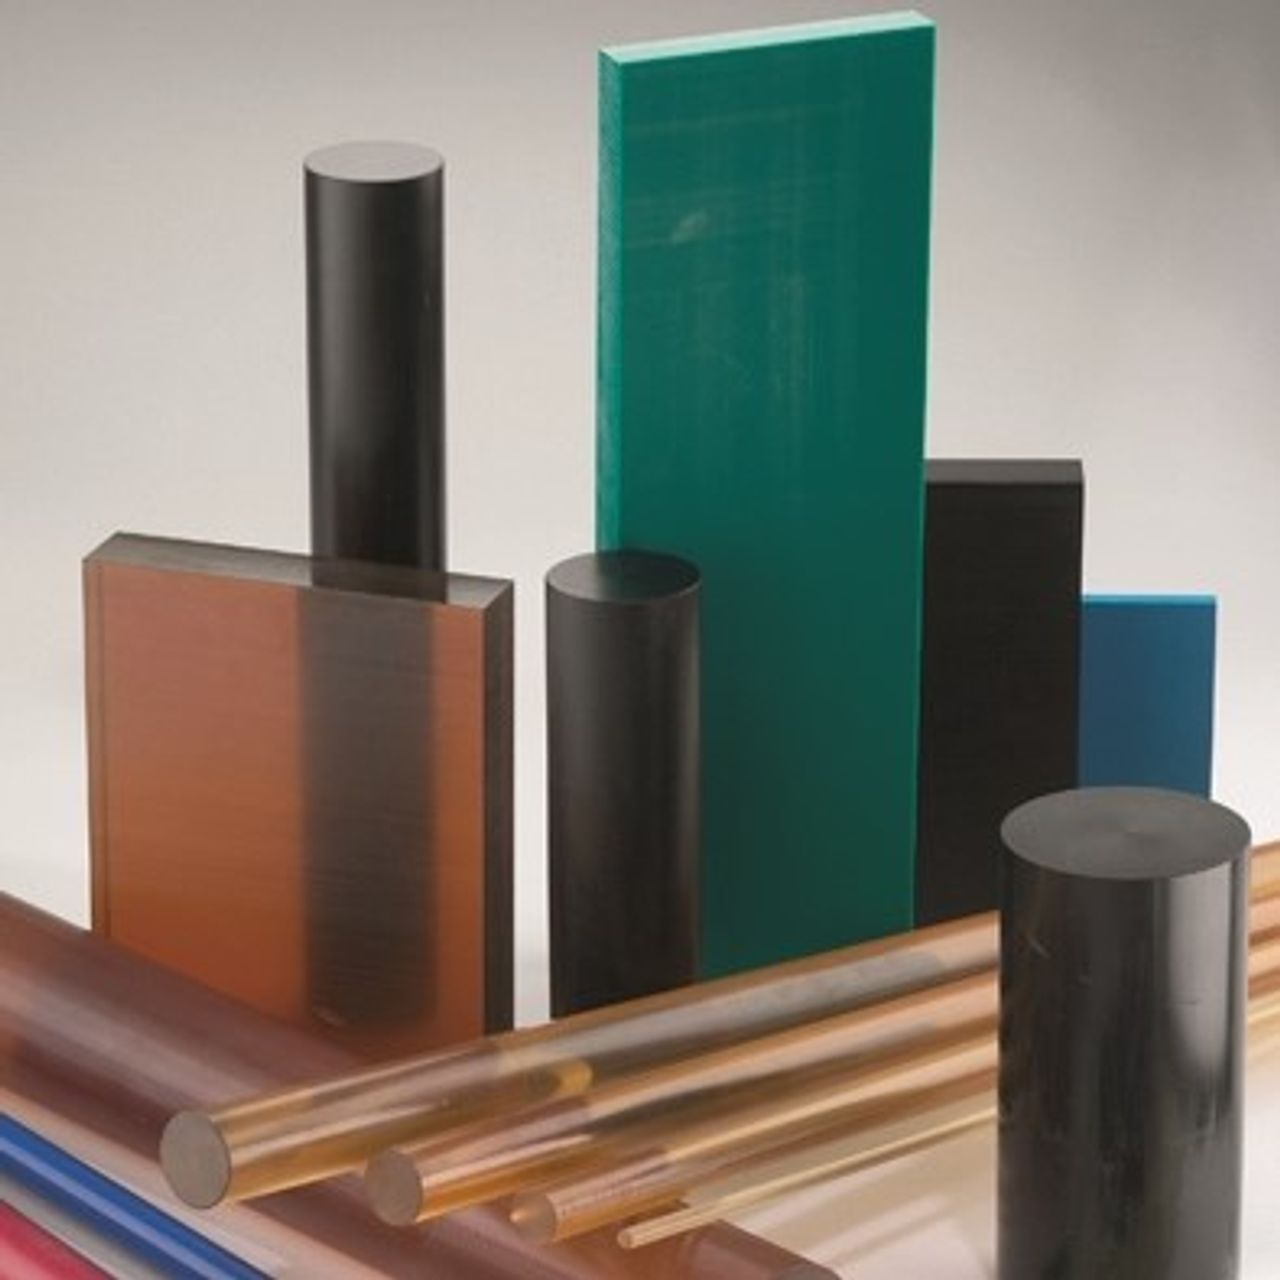 PSU (Polysulfon) kunststof platen en staf materialen